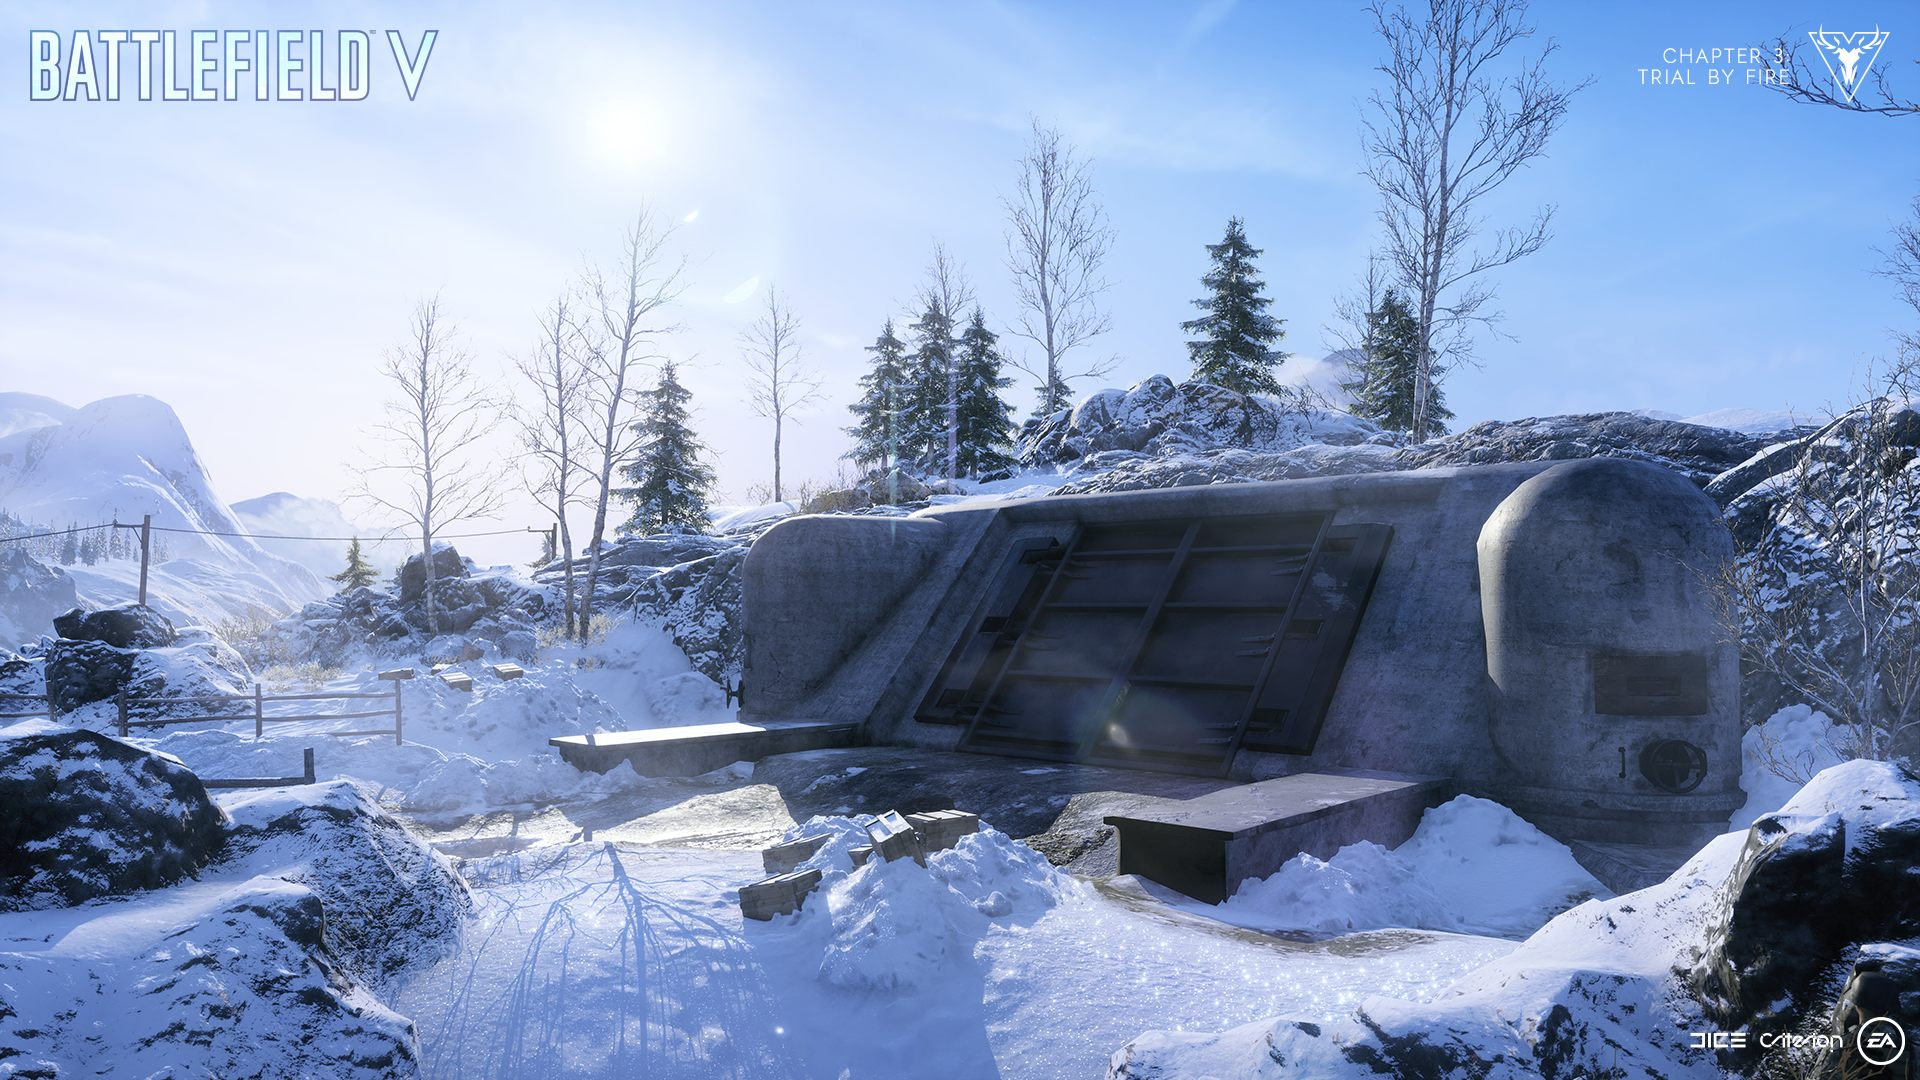 Firestorm Battlefield 5 v battle royale mode bunker screenshot vehicles